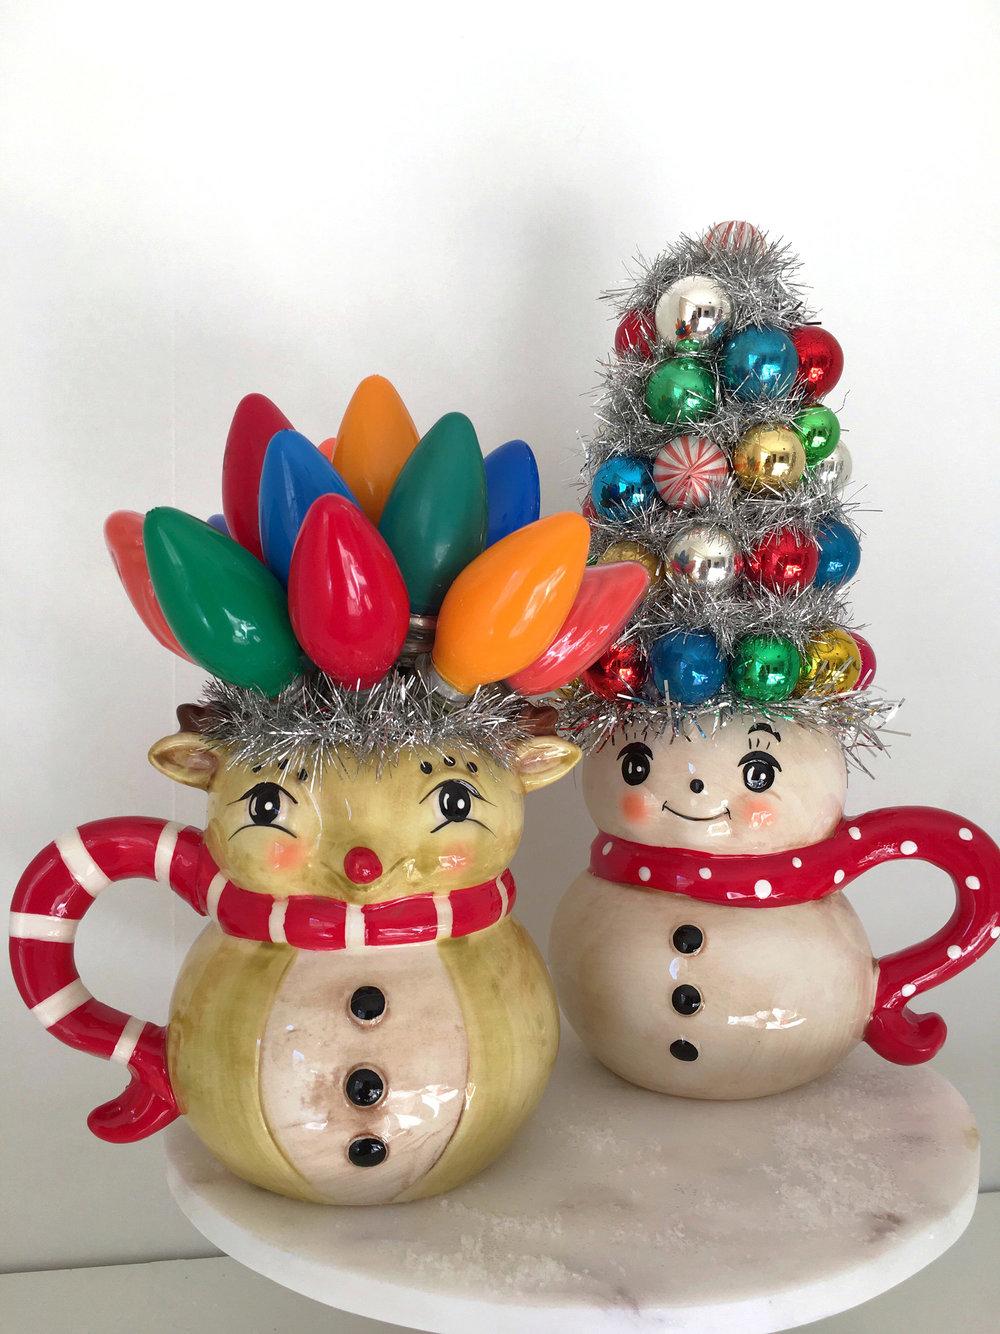 JPD Partners in Craft * White Christmas Studio + Johanna Parker Design * Artist Collaboration